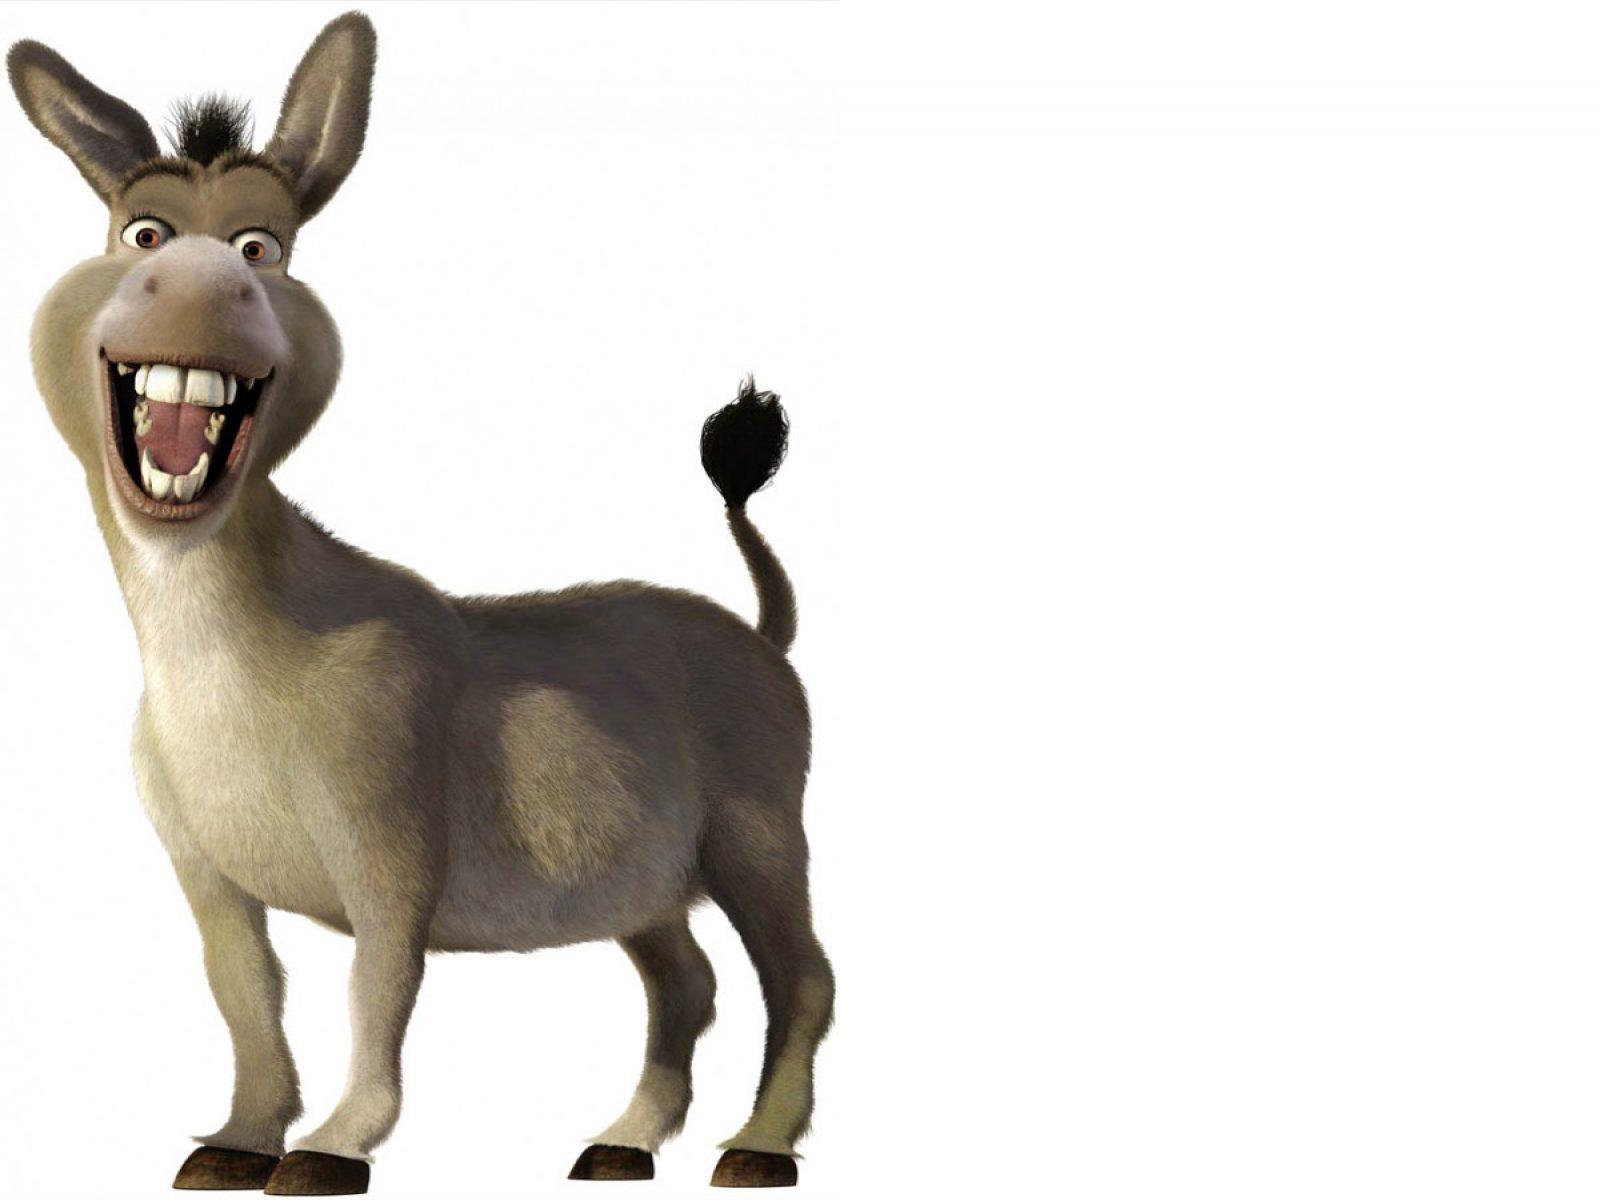 Shrek Donkey Clipart Shrek Donkey Clipart Nativity